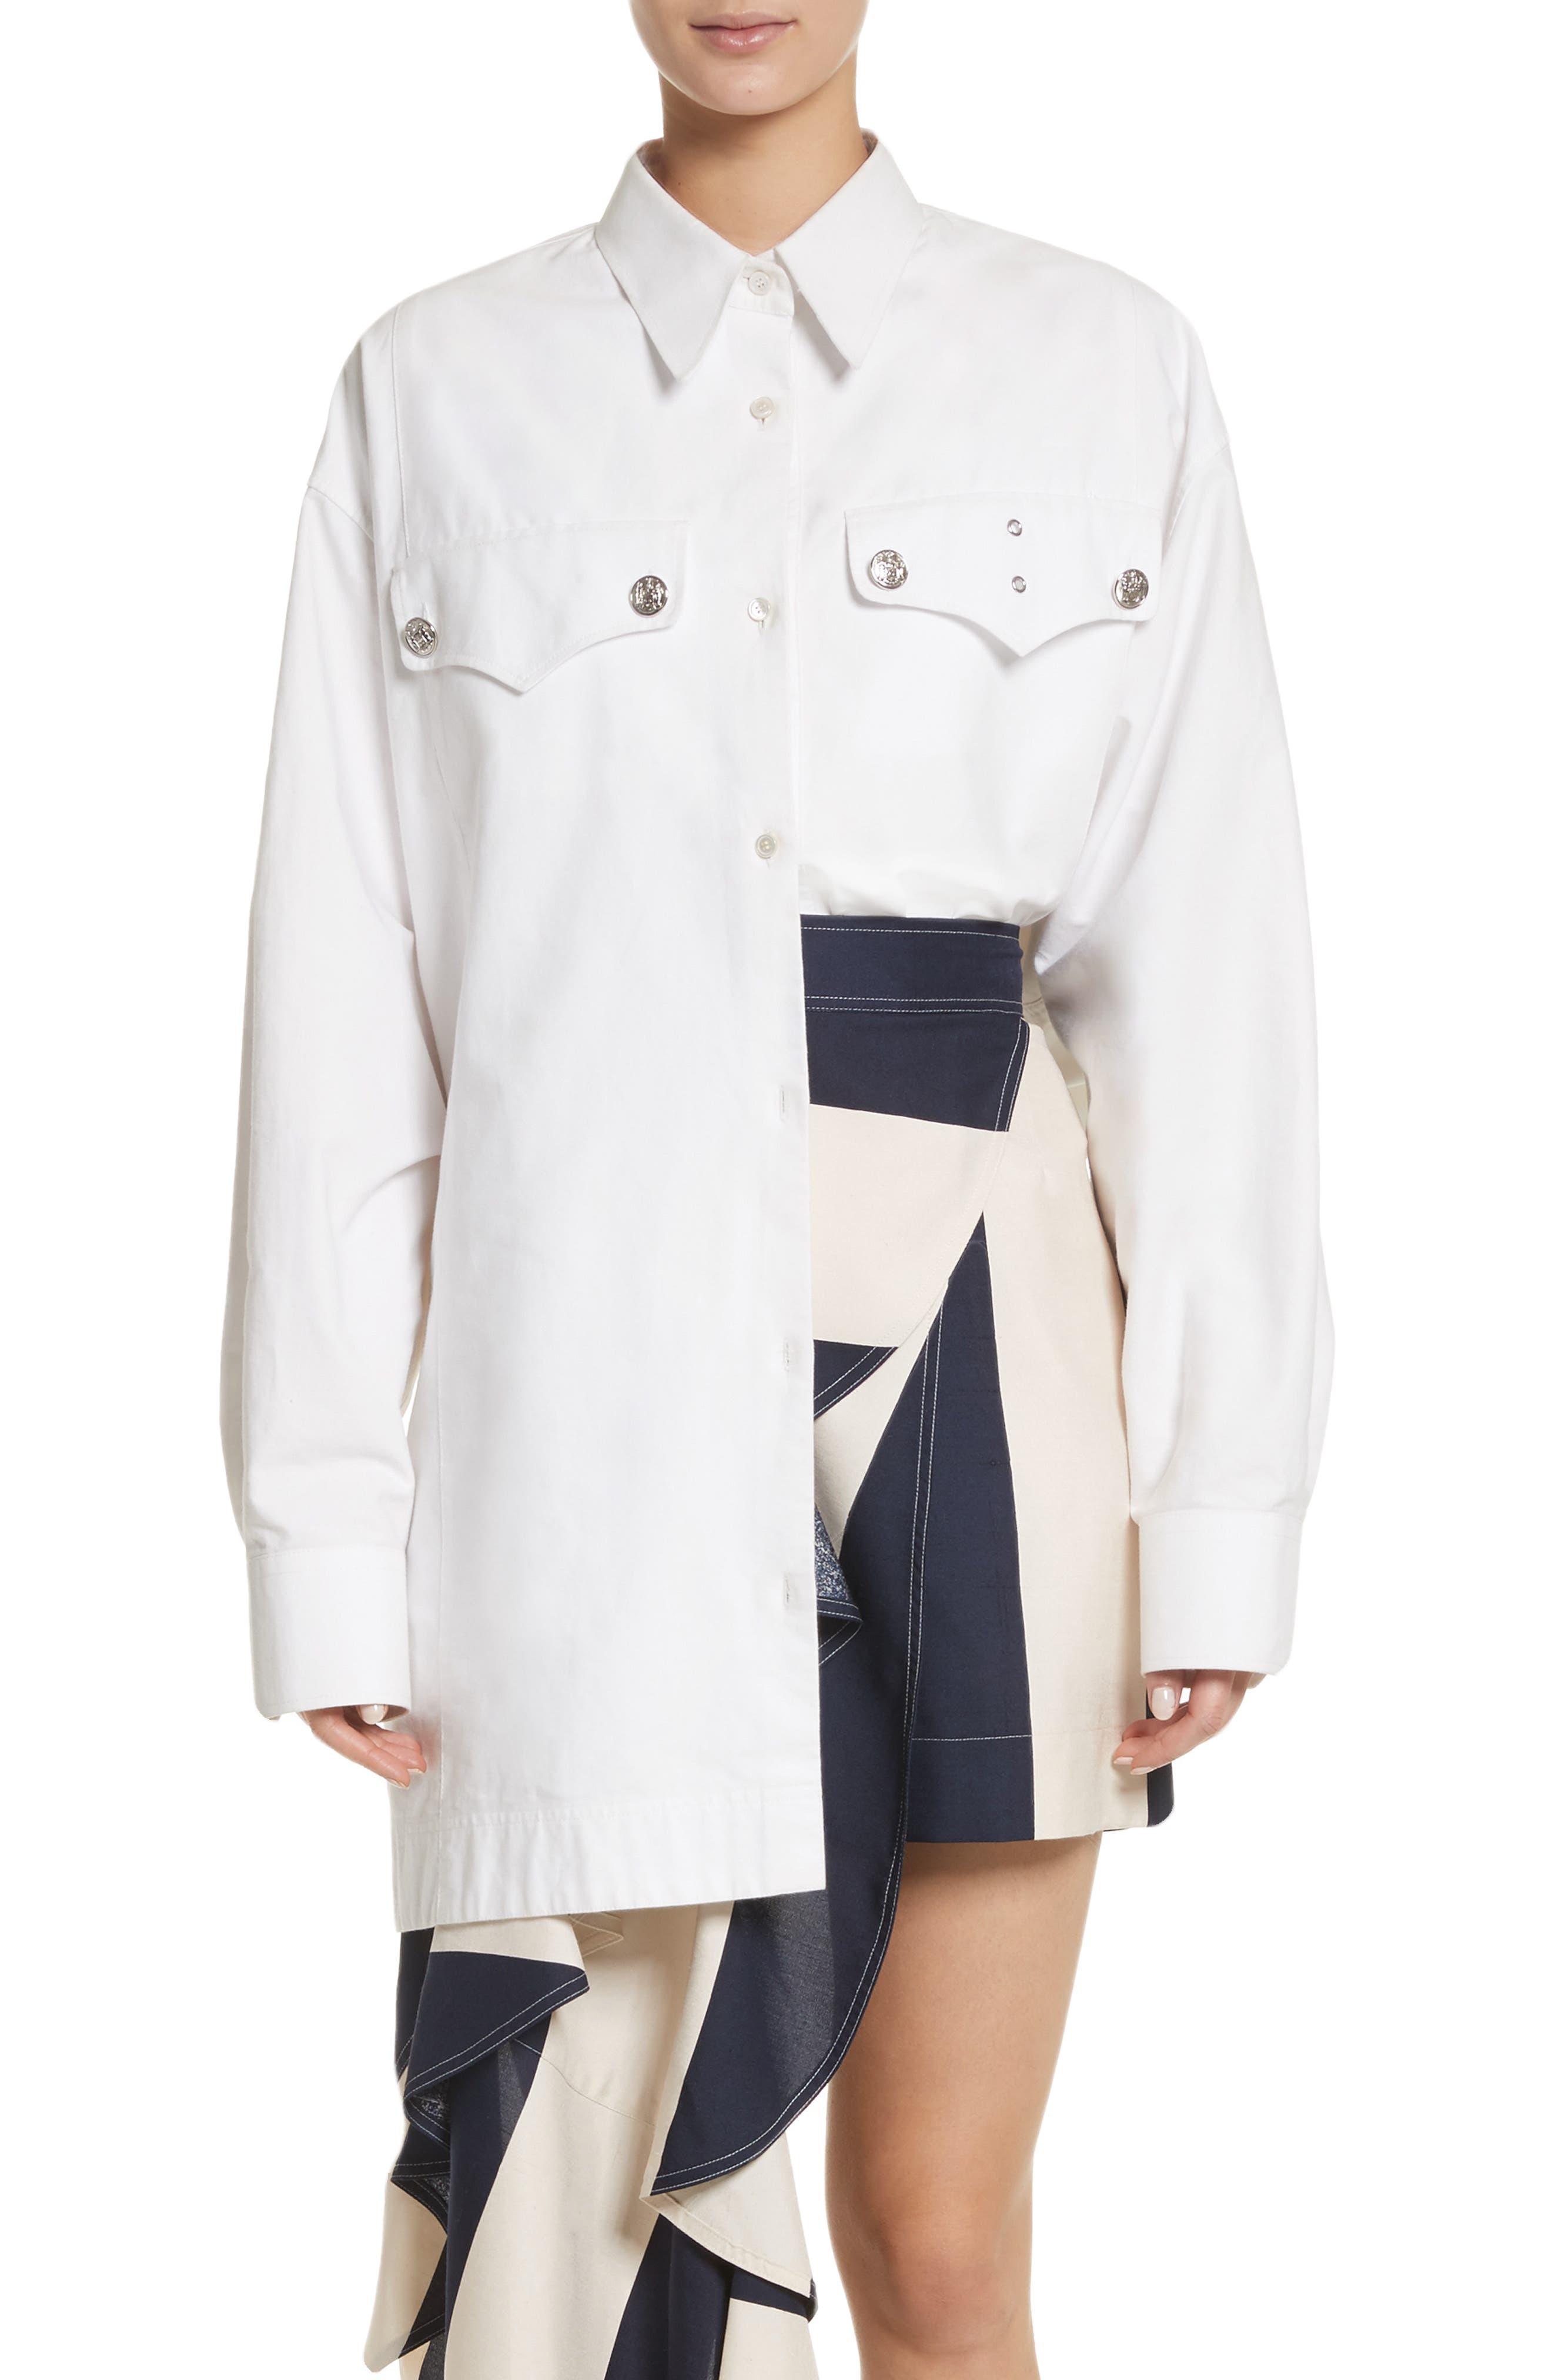 Alternate Image 1 Selected - Calvin Klein 205W39NYC Oversize Policeman Shirt